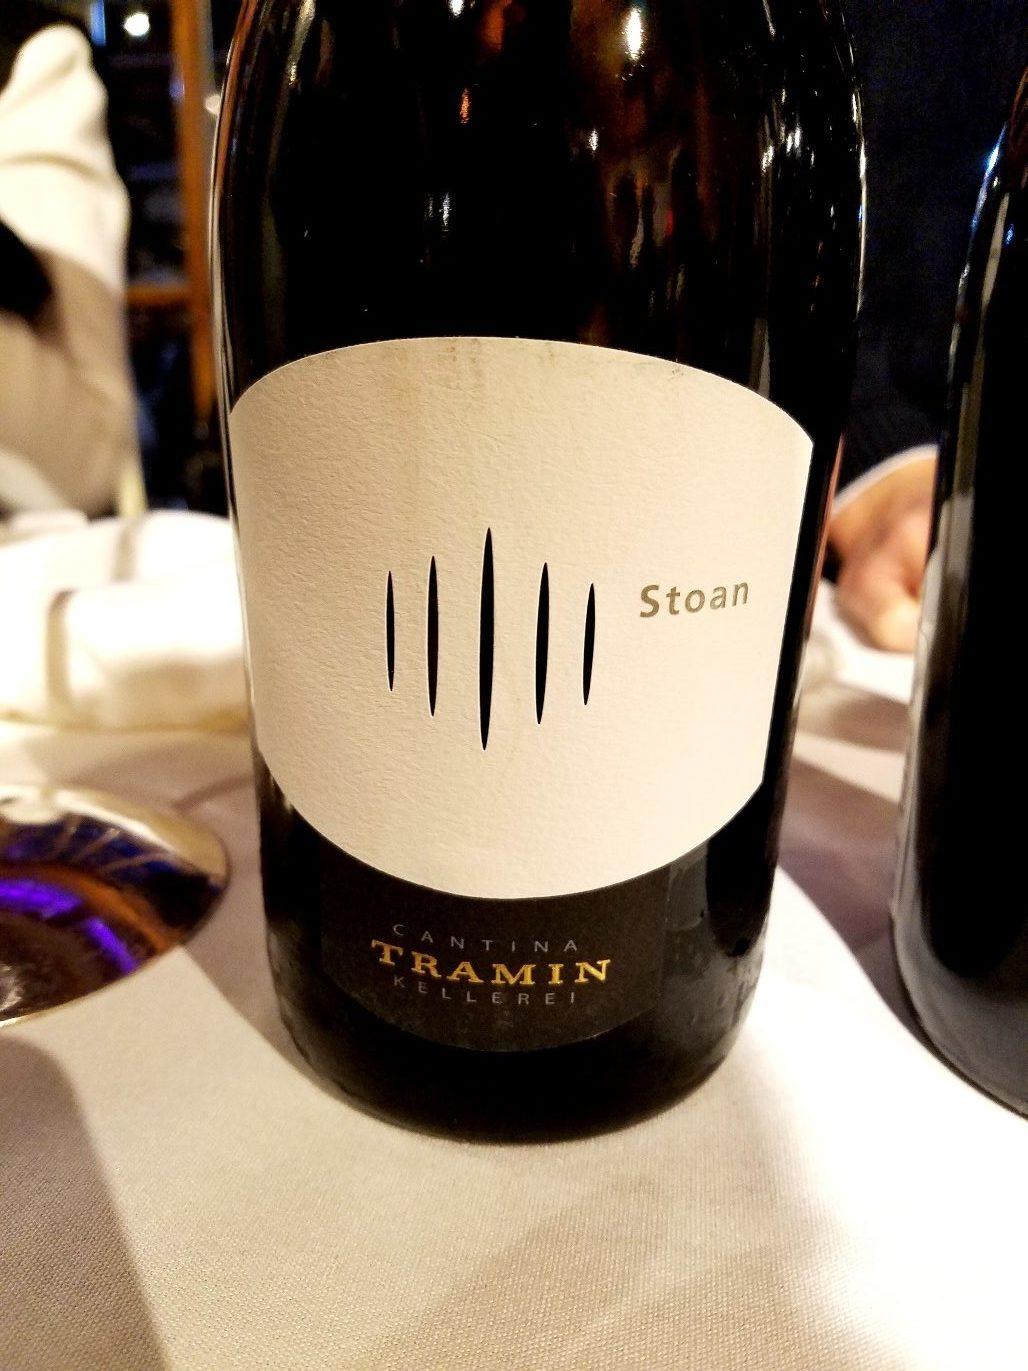 Cantina Tramin Kellerei Stoan 2017, James Suckling Great Wines of Italy New York 2020, Wine Casual